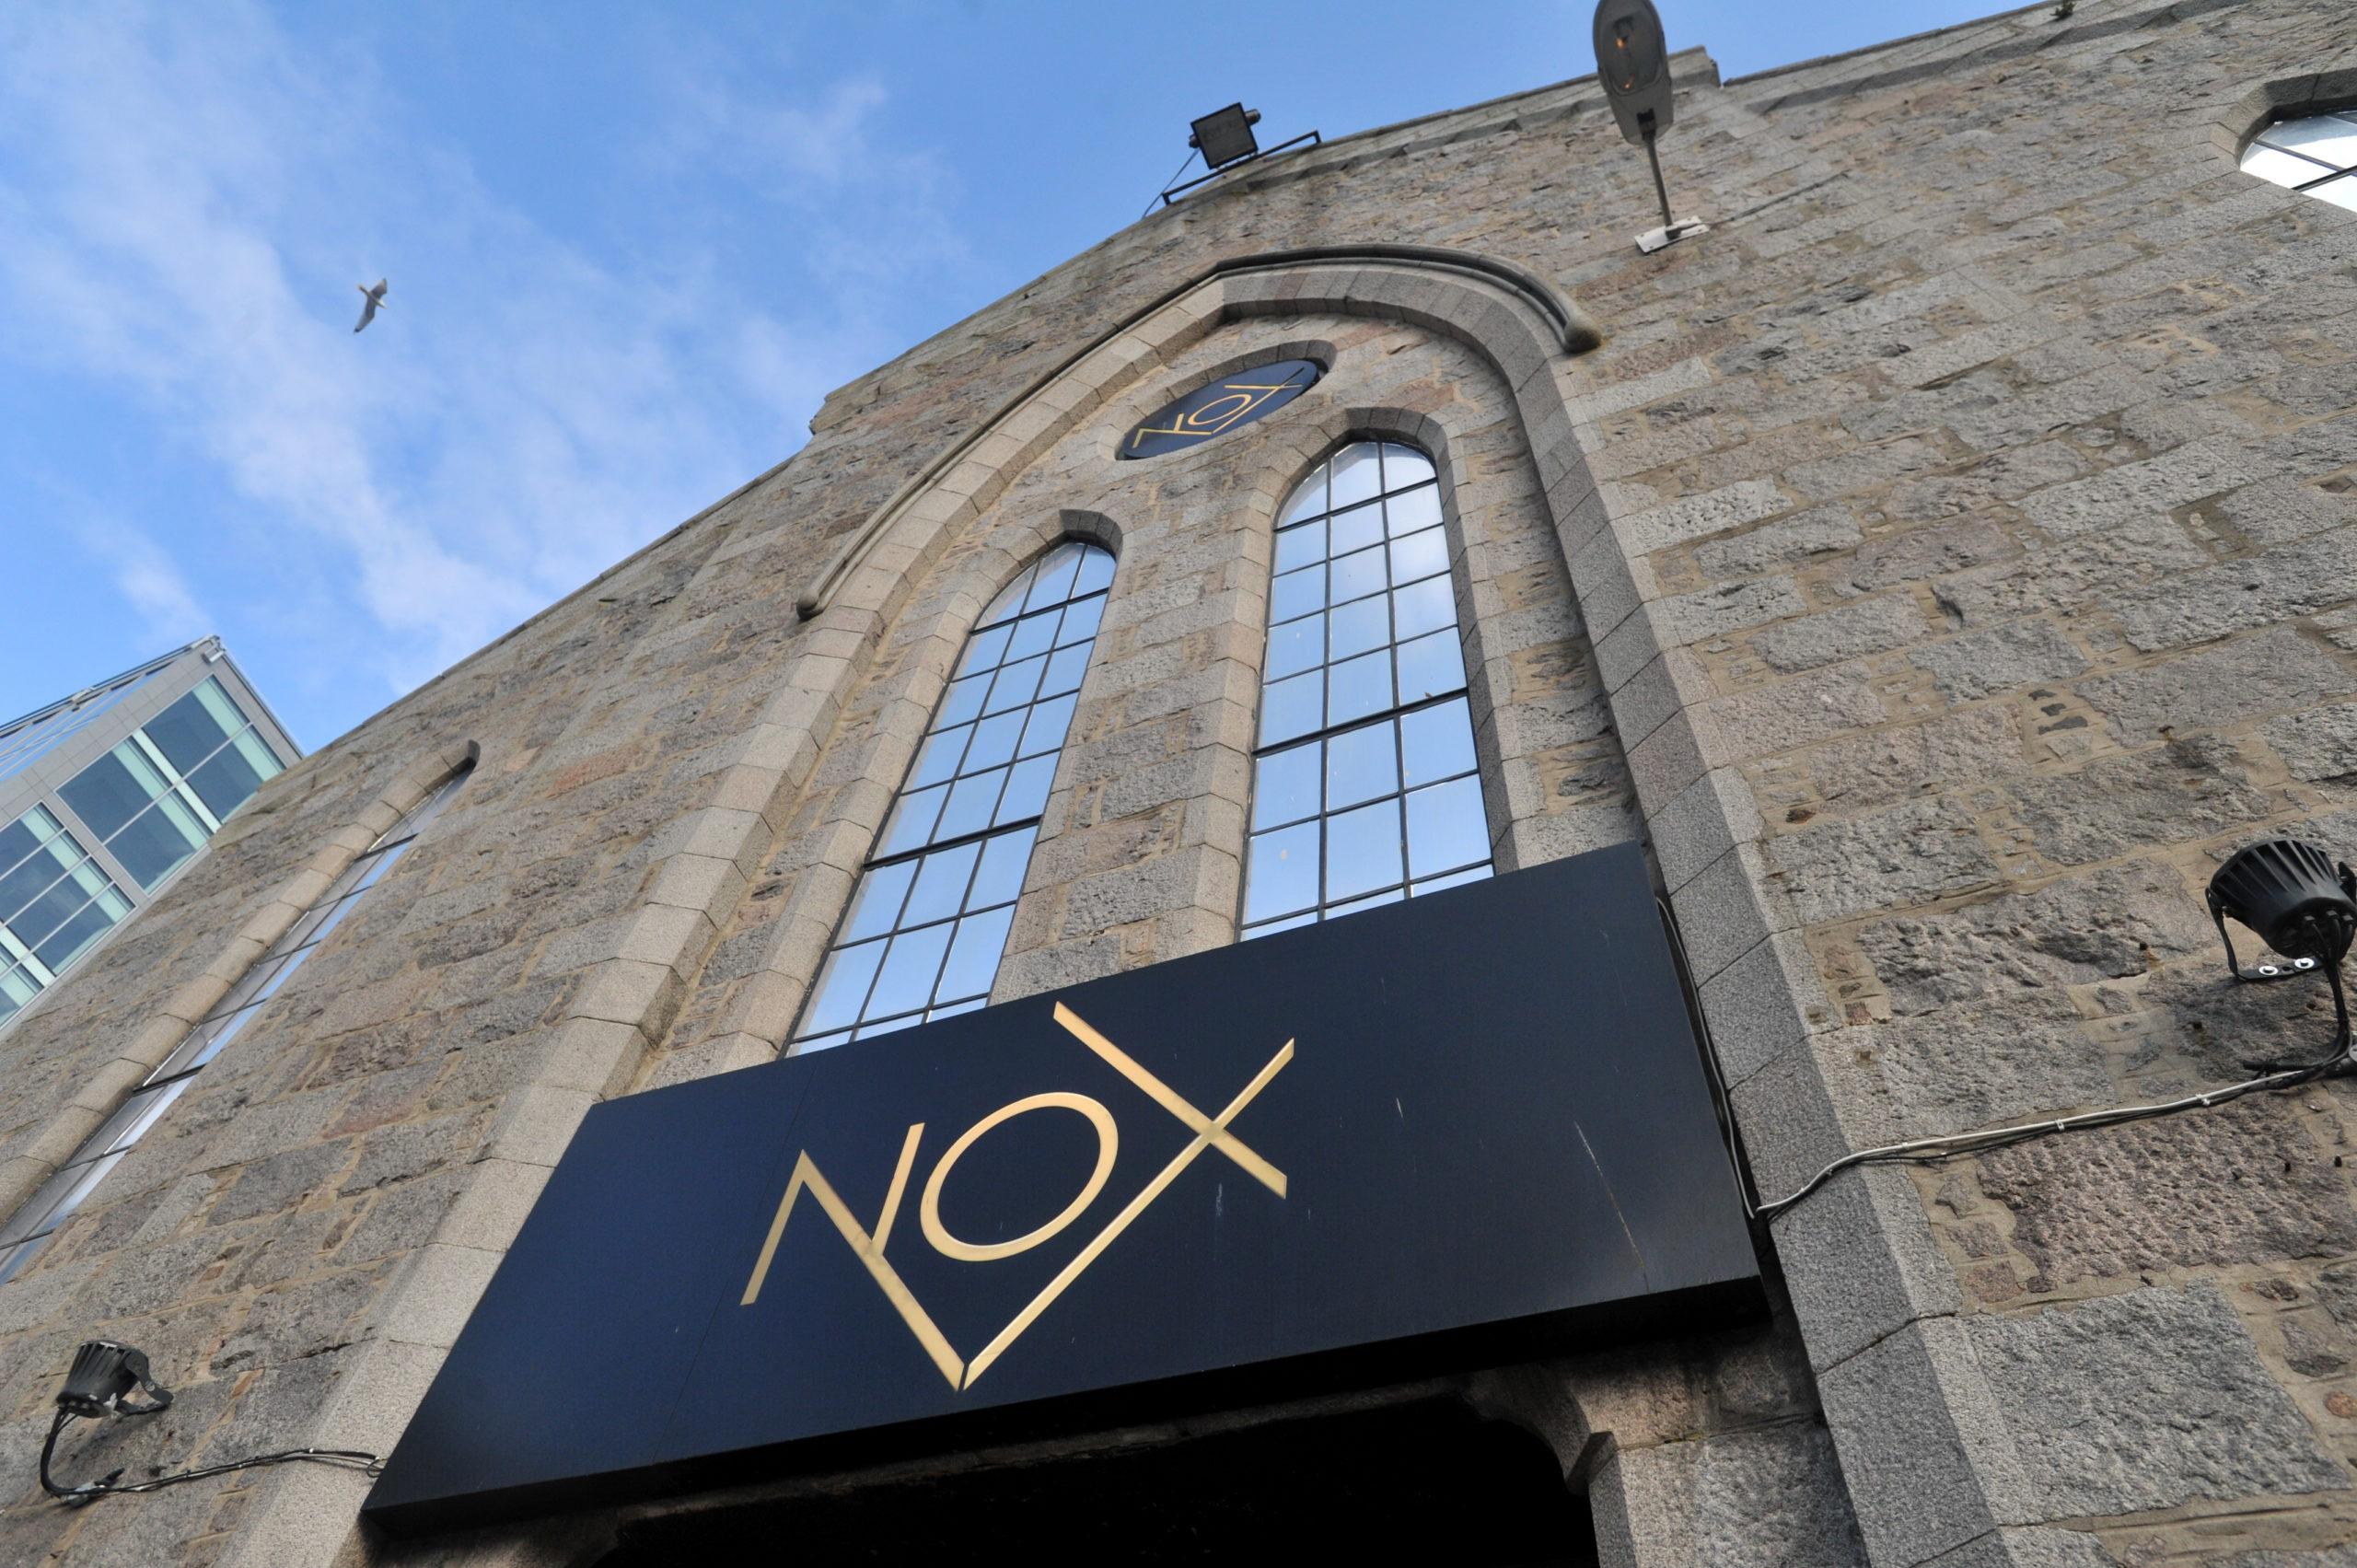 Nox, Justice Mill Lane, Aberdeen.